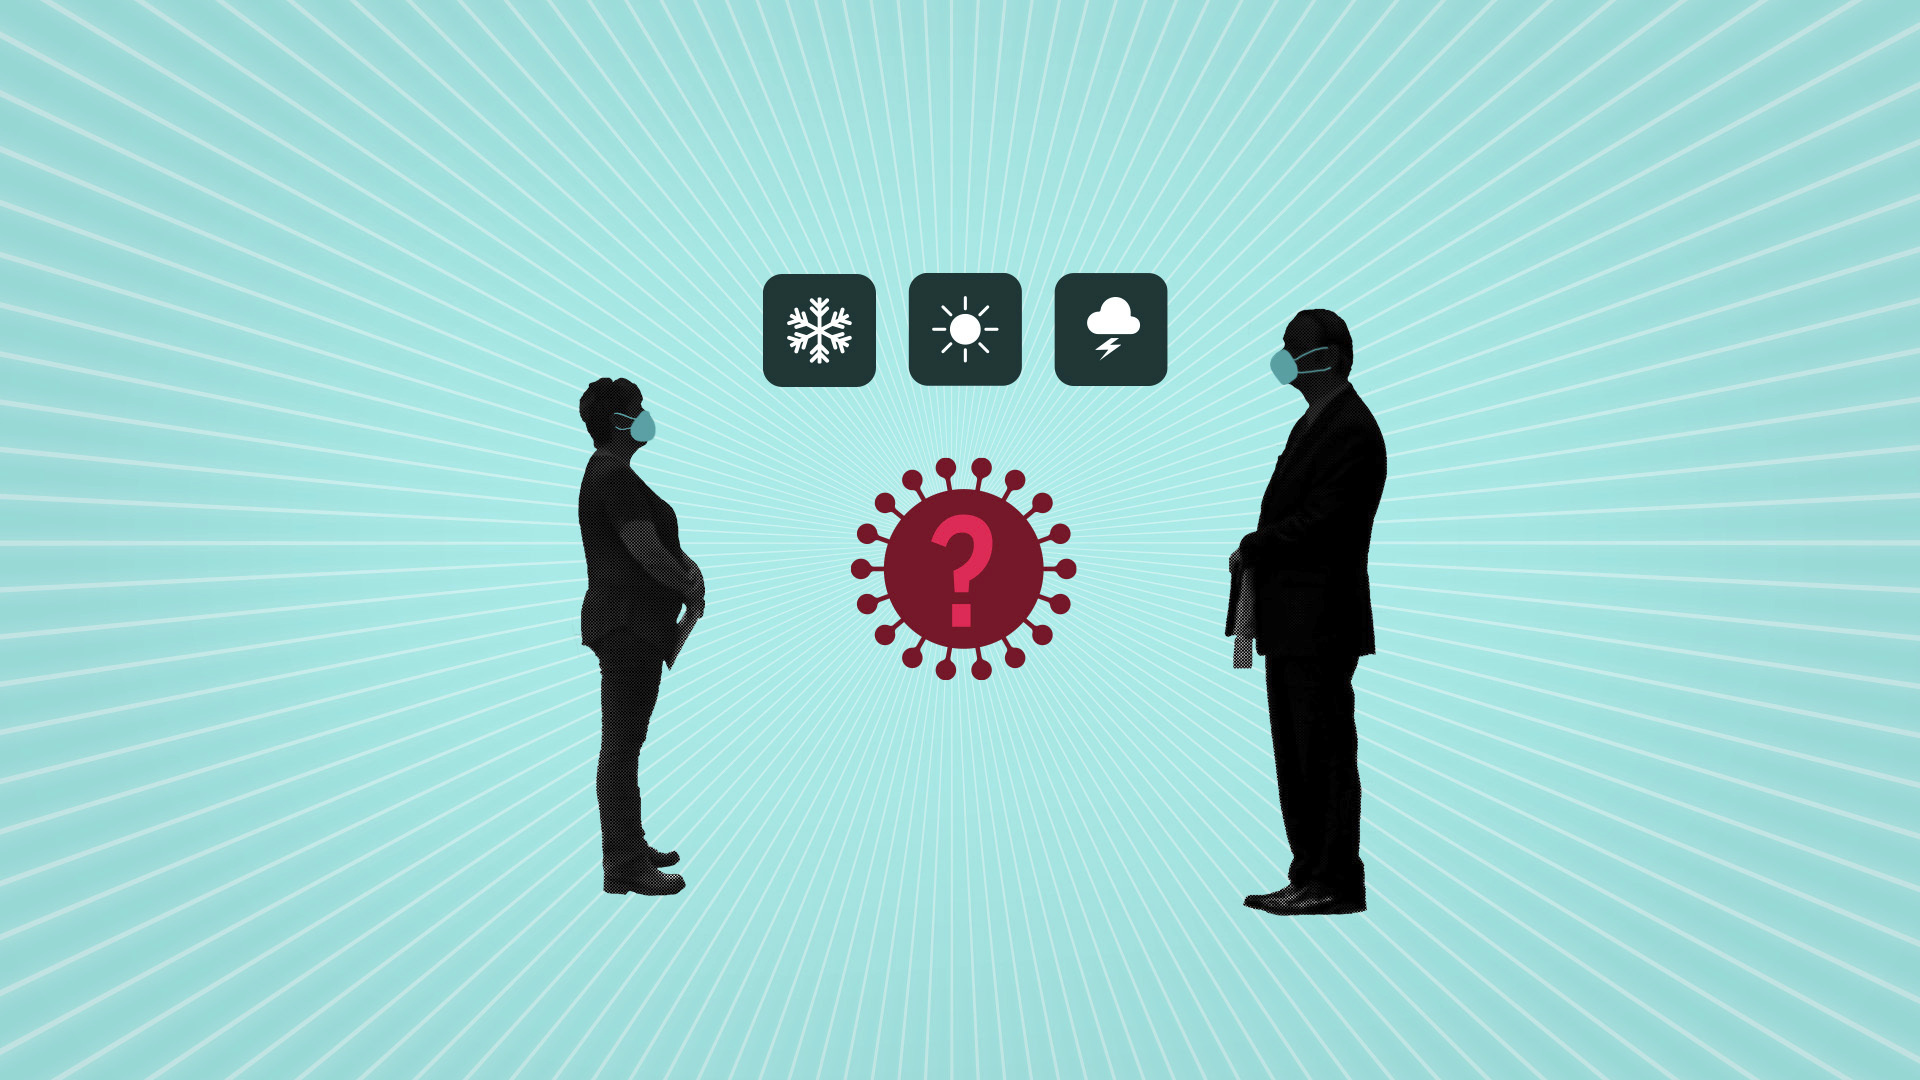 VIRUS OUTBREAK VIRAL QUESTIONS CORONAVIRUS WEATHER